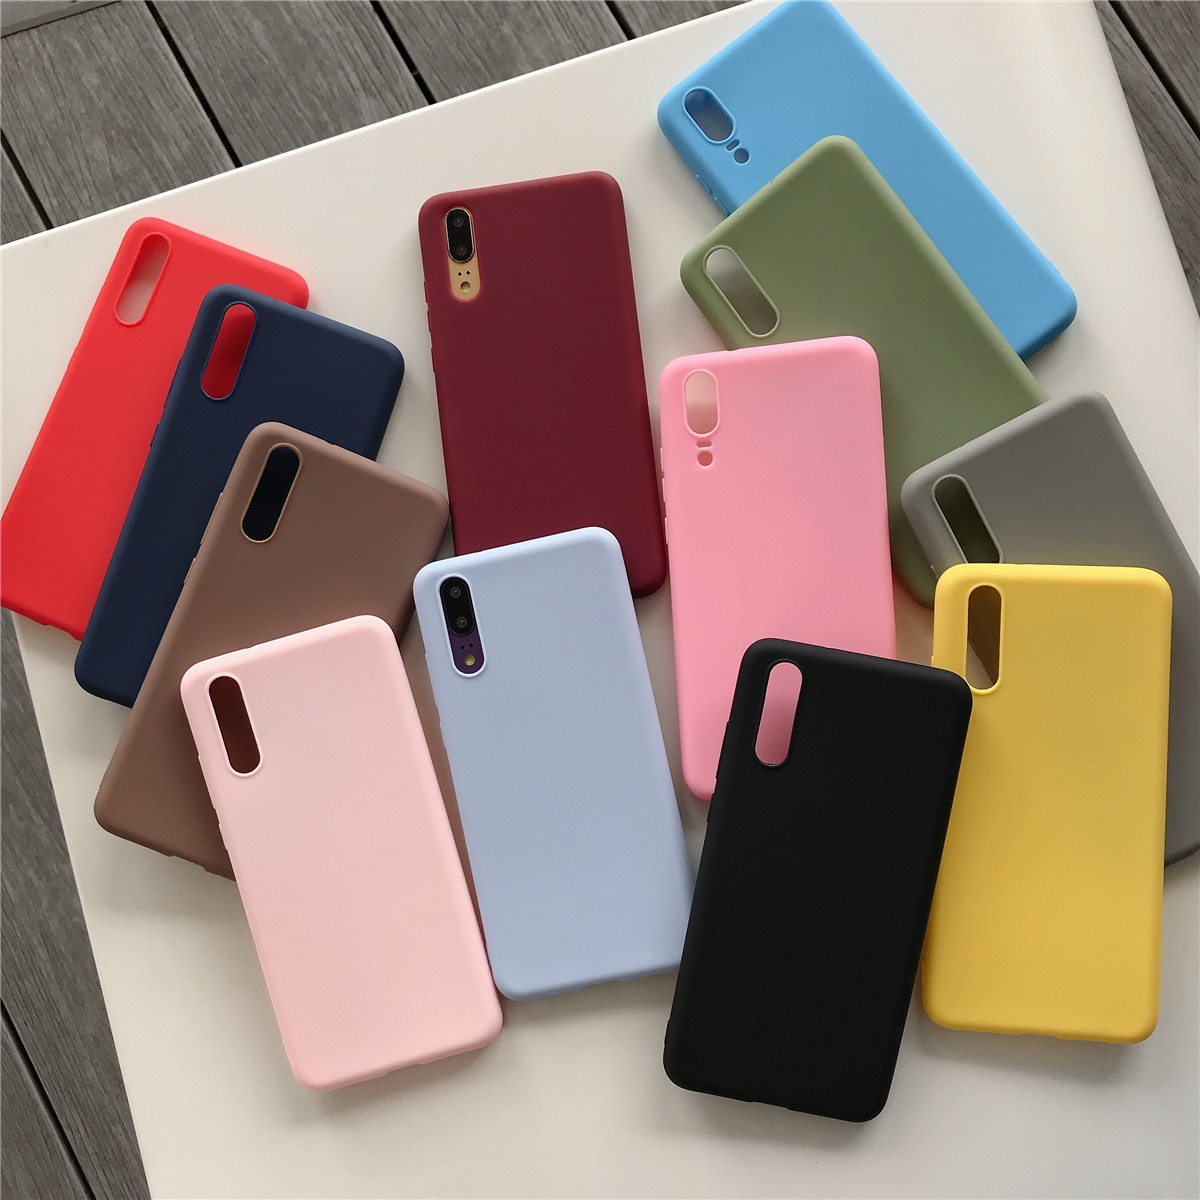 Funda Color caramelo para Samsung Galaxy A50 A20 A30 A50 J7 PRO J2 Prime silicona suave a prueba de golpes